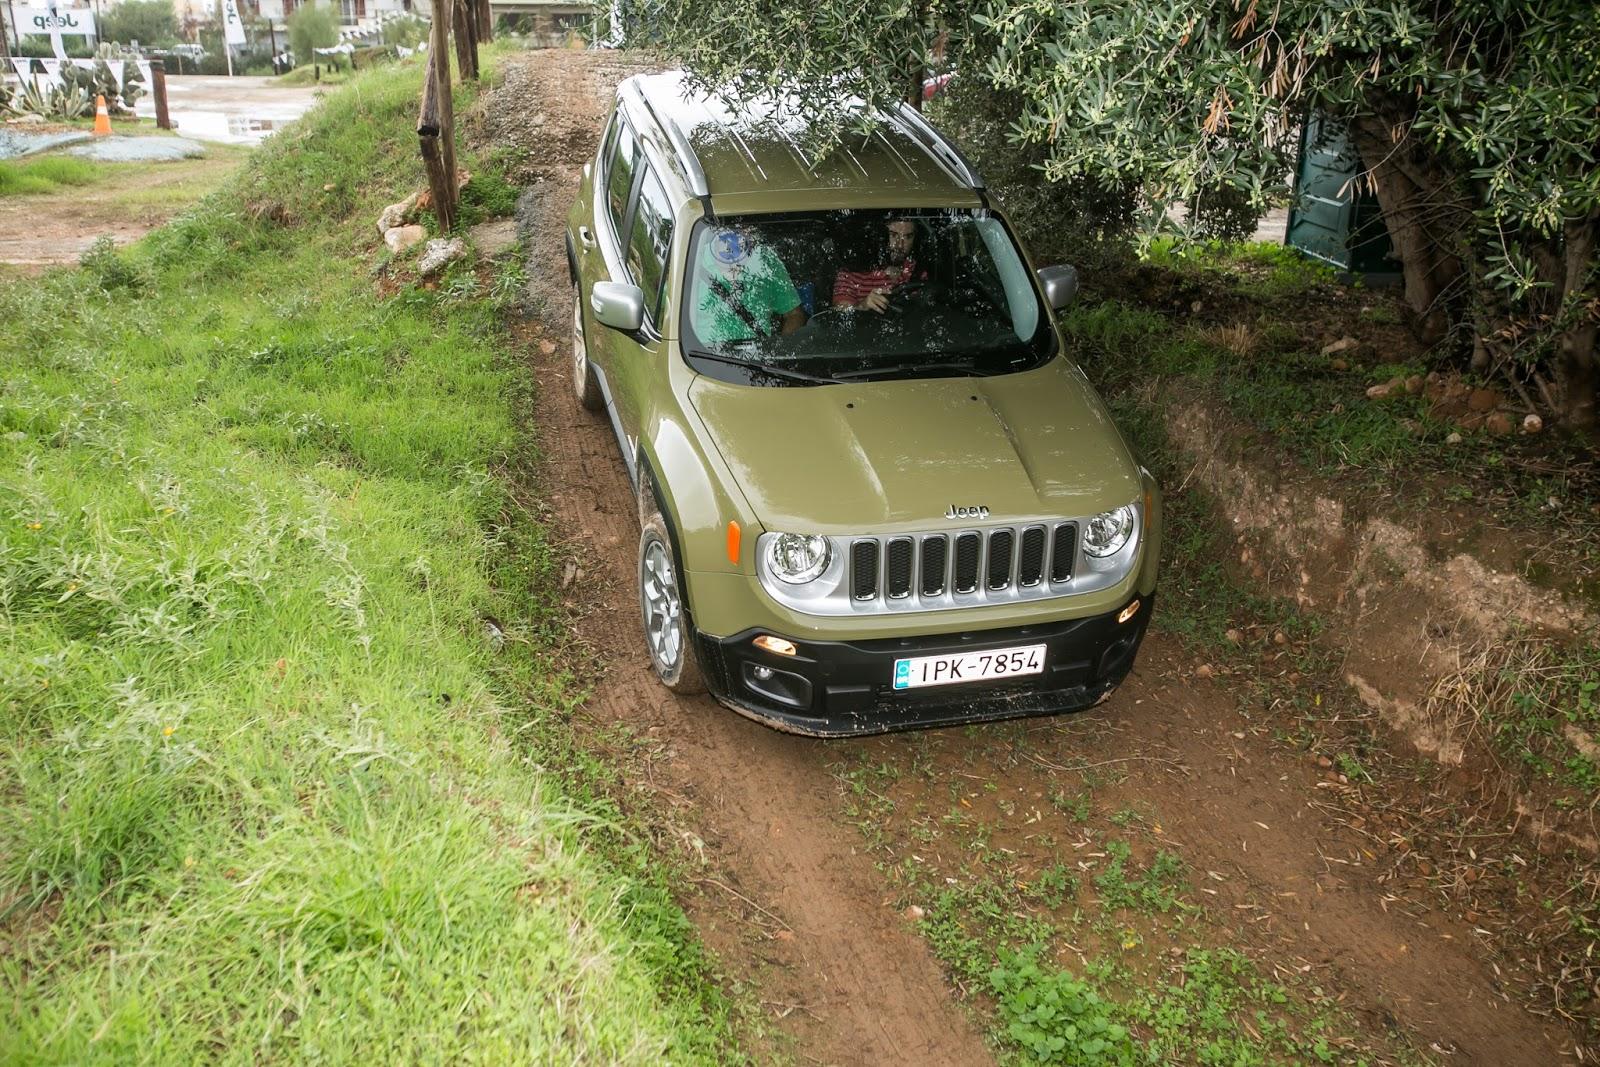 GK 0363 Πετάμε ένα Jeep Renegade σε λάσπες, πέτρες, άμμο, λίμνες. Θα τα καταφέρει; Jeep, Jeep Renegade, Renegade, SUV, TEST, zblog, ΔΟΚΙΜΕΣ